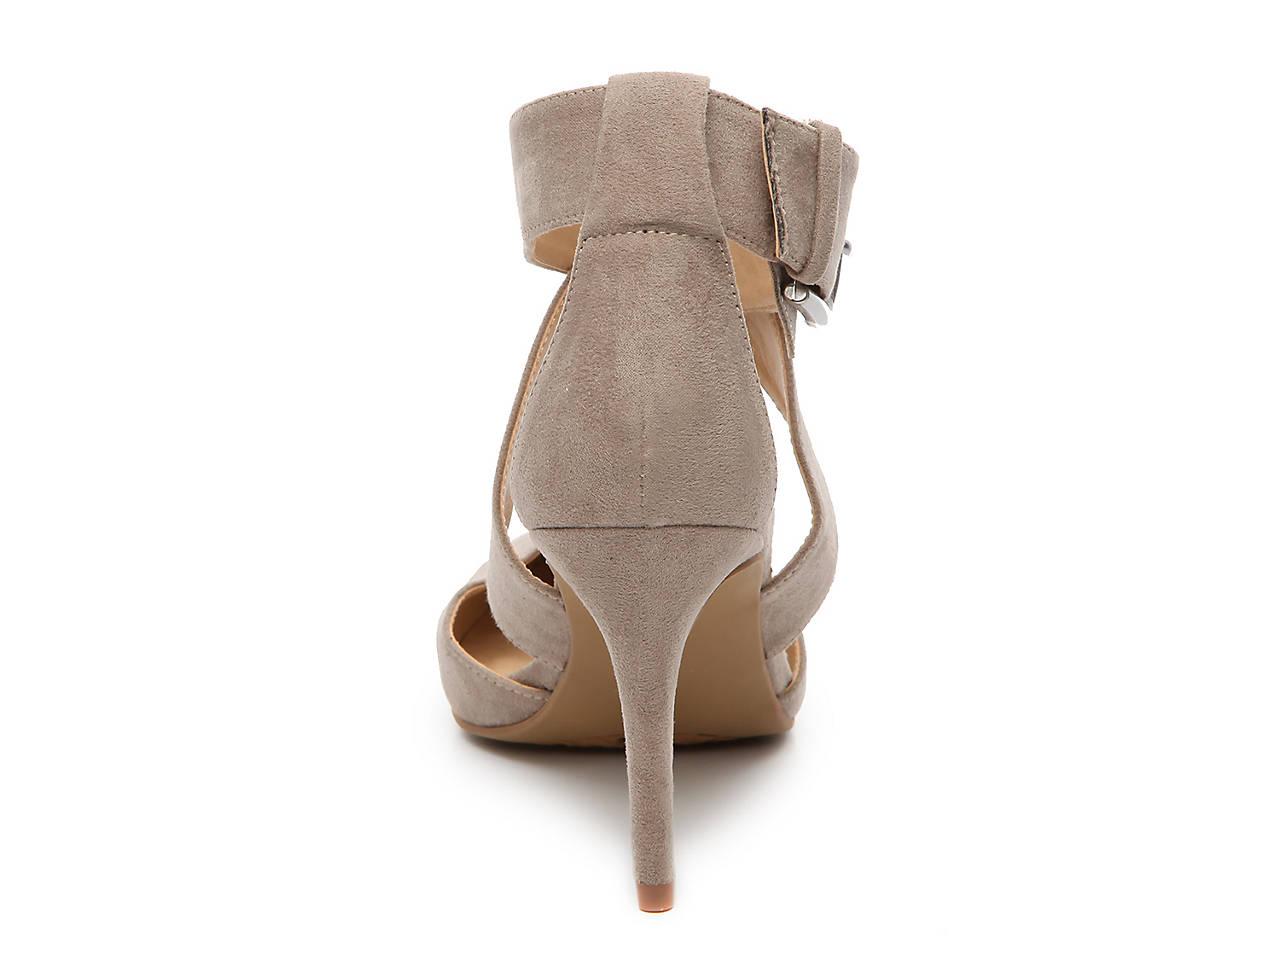 b23b16b93dcf Chinese Laundry Racquel Pump Women s Shoes